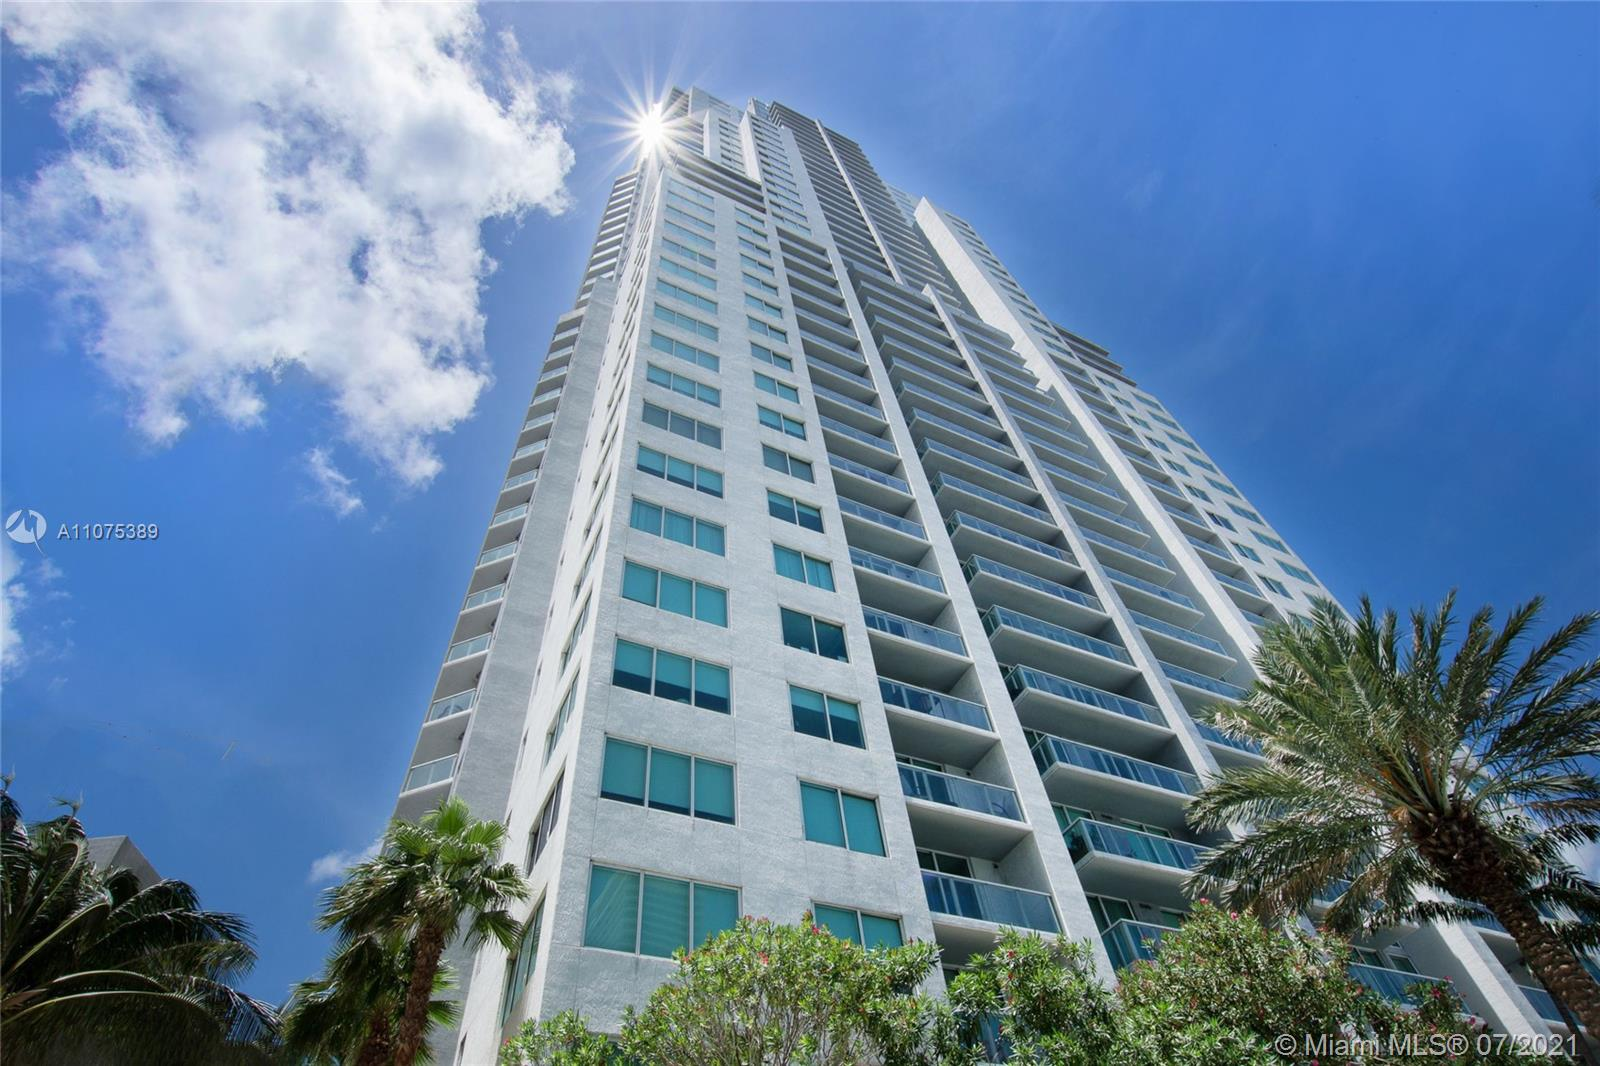 Vizcayne One #502 - 244 Biscayne Blvd #502, Miami, FL 33132